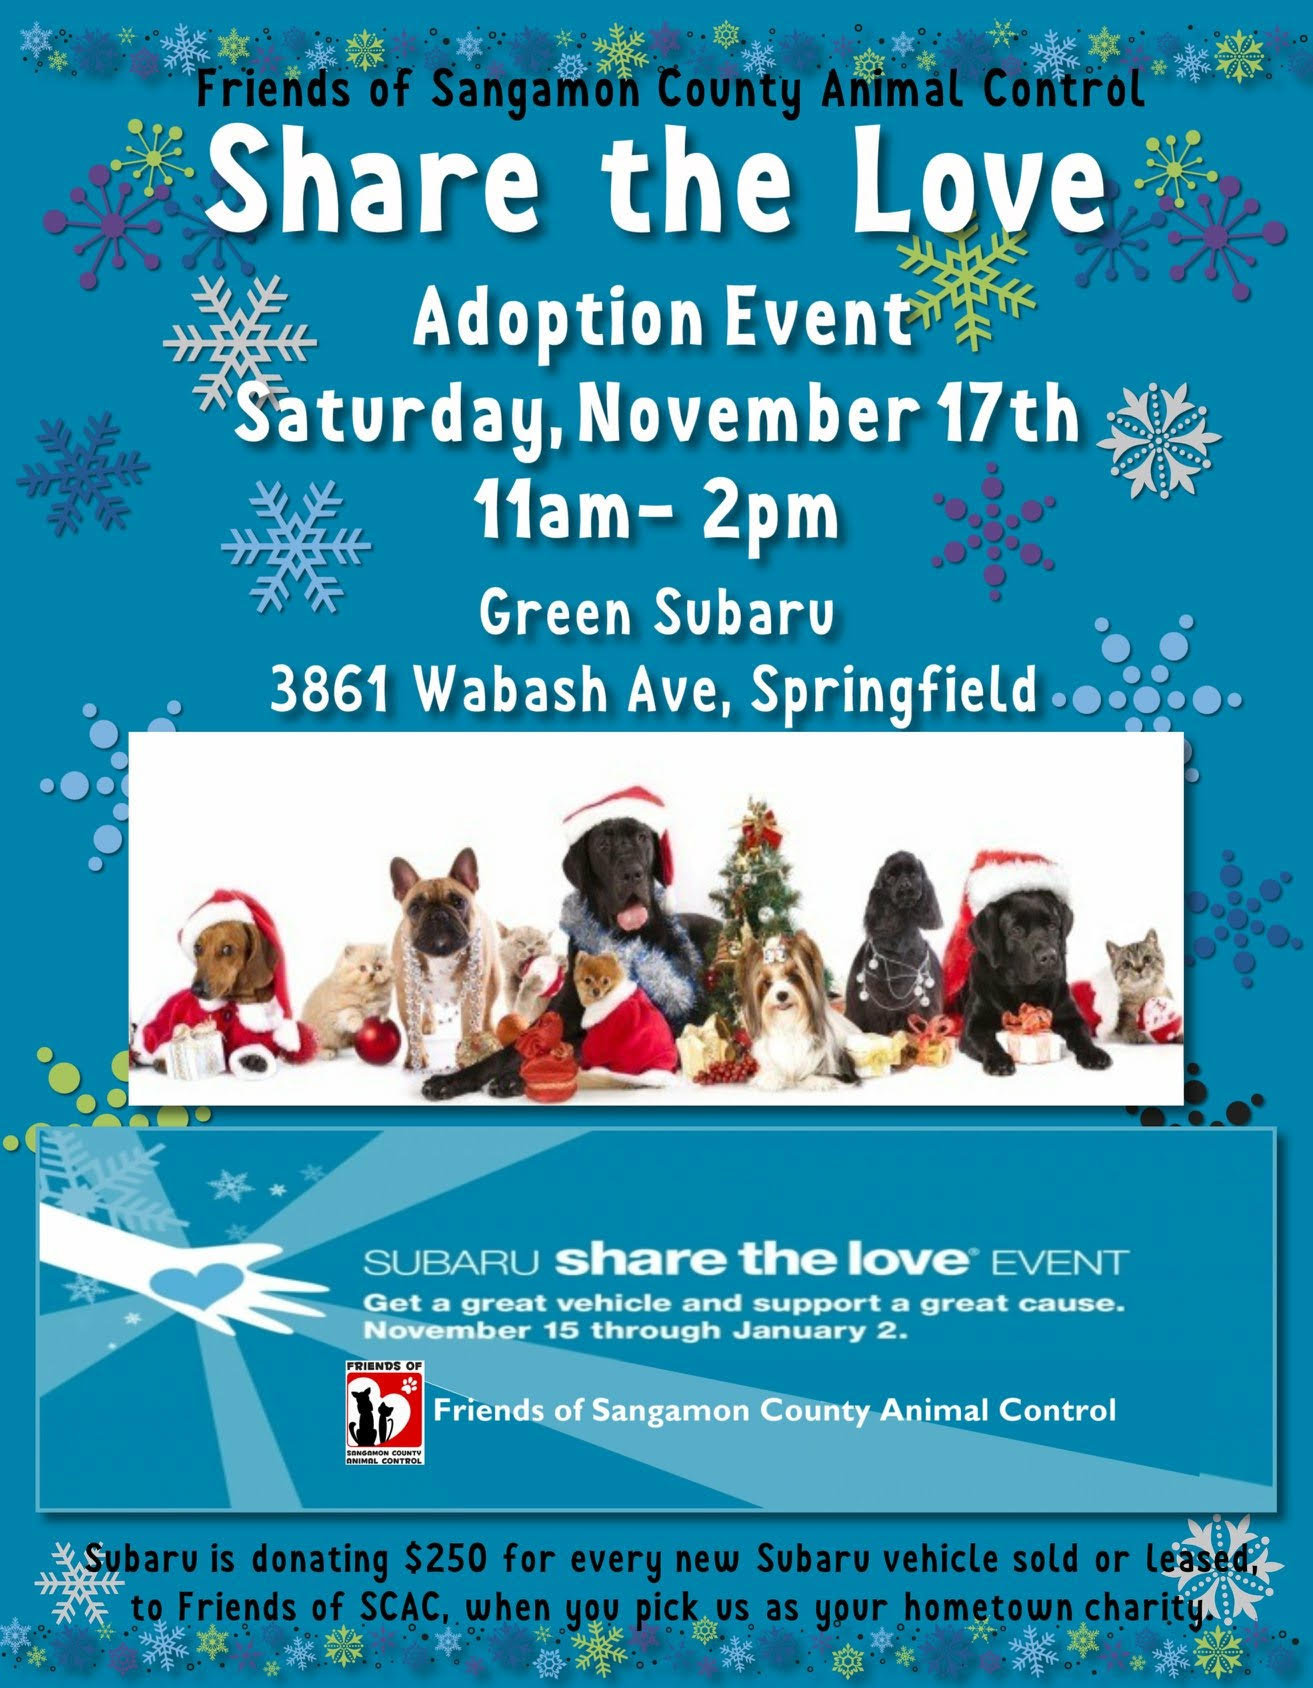 Share the Love Adoption Event Flyer 2018.jpg